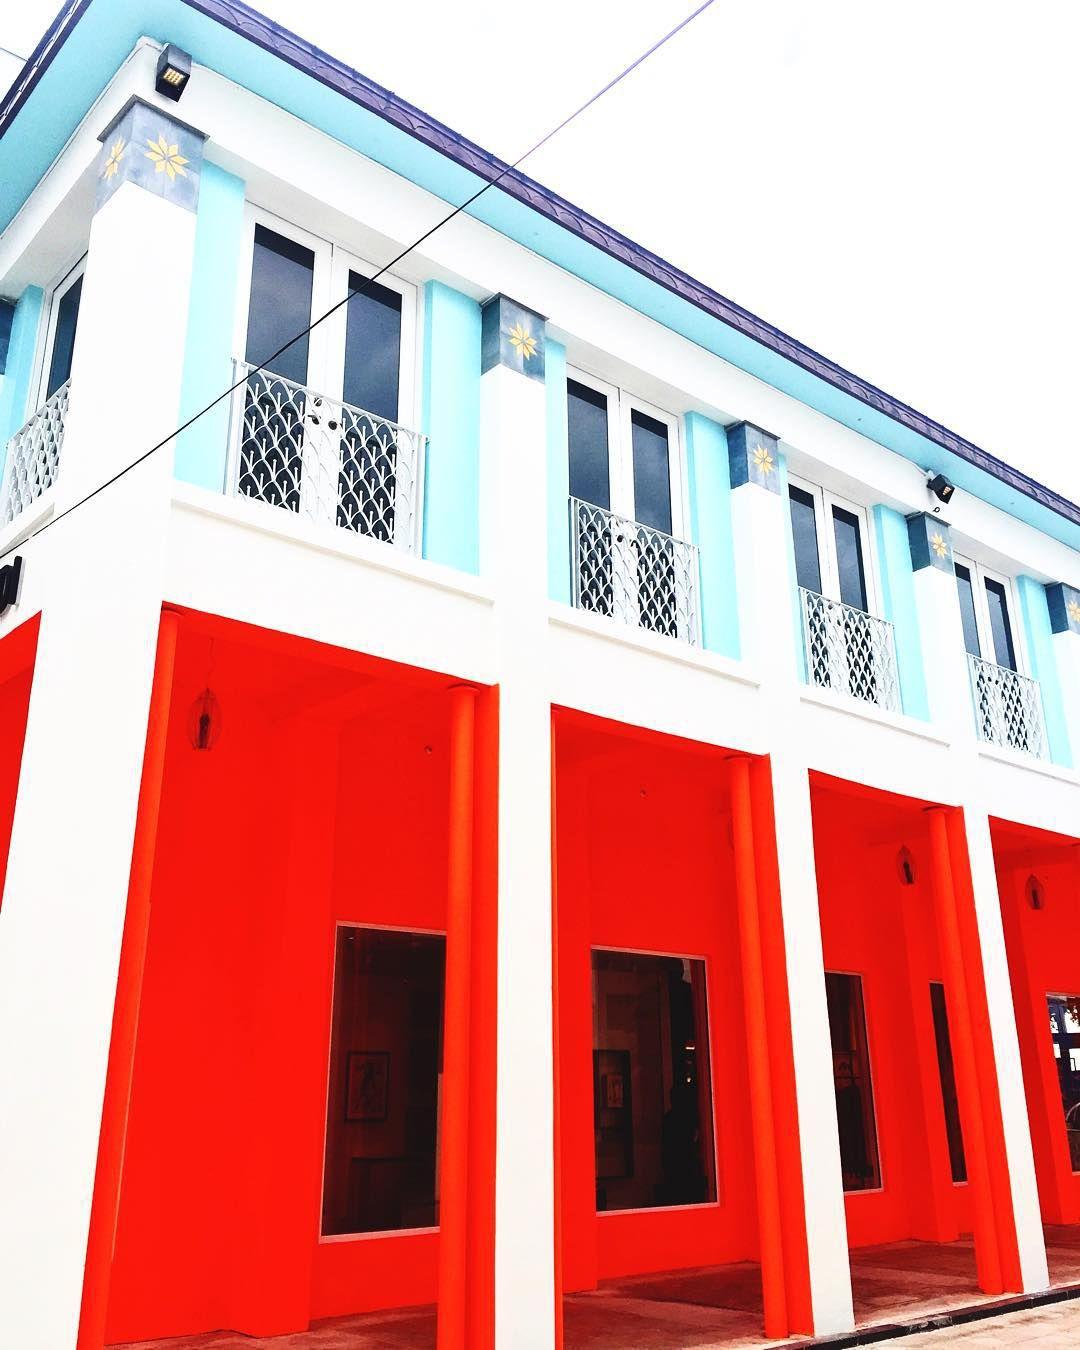 The New Fendi Casa Voyagingaround Miamidesigndistrict Colorblocks Neondistrict Fendi Voninmiami Vonvoyage In 2020 Outdoor Decor Decor Home Decor